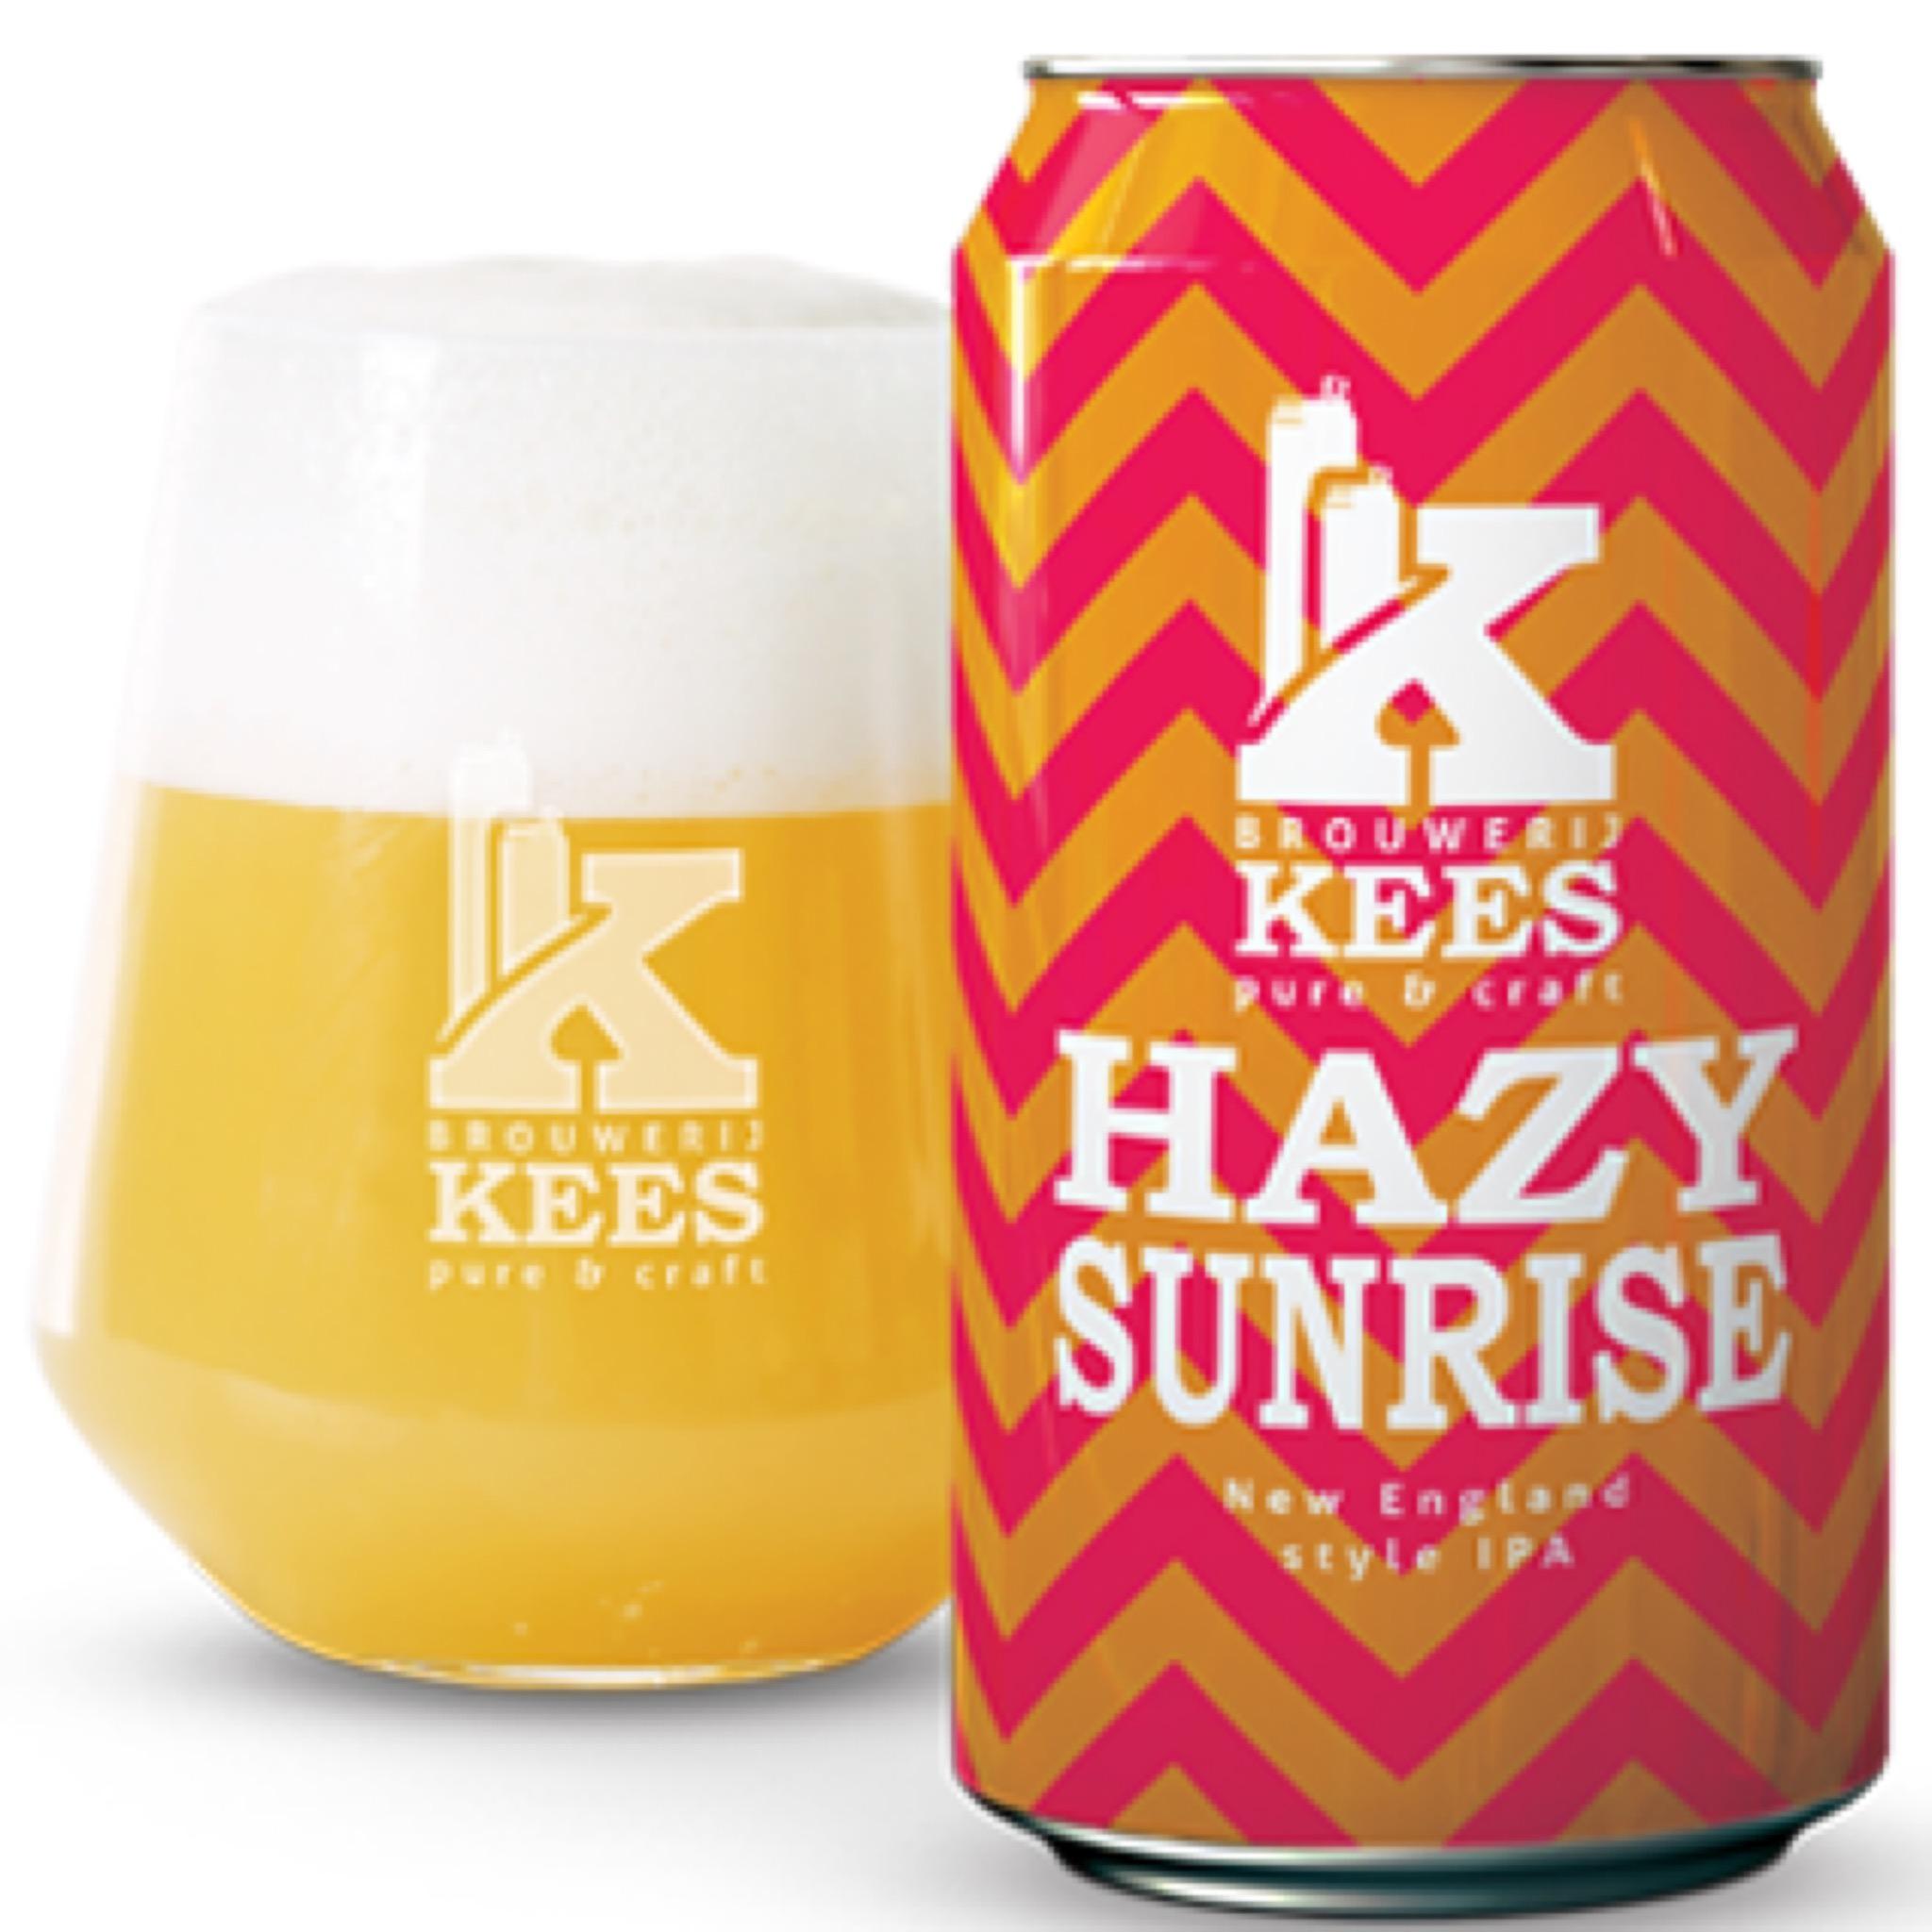 Hazy Sunrise NE IPA 7.1% 330ml Brouwerij Kees